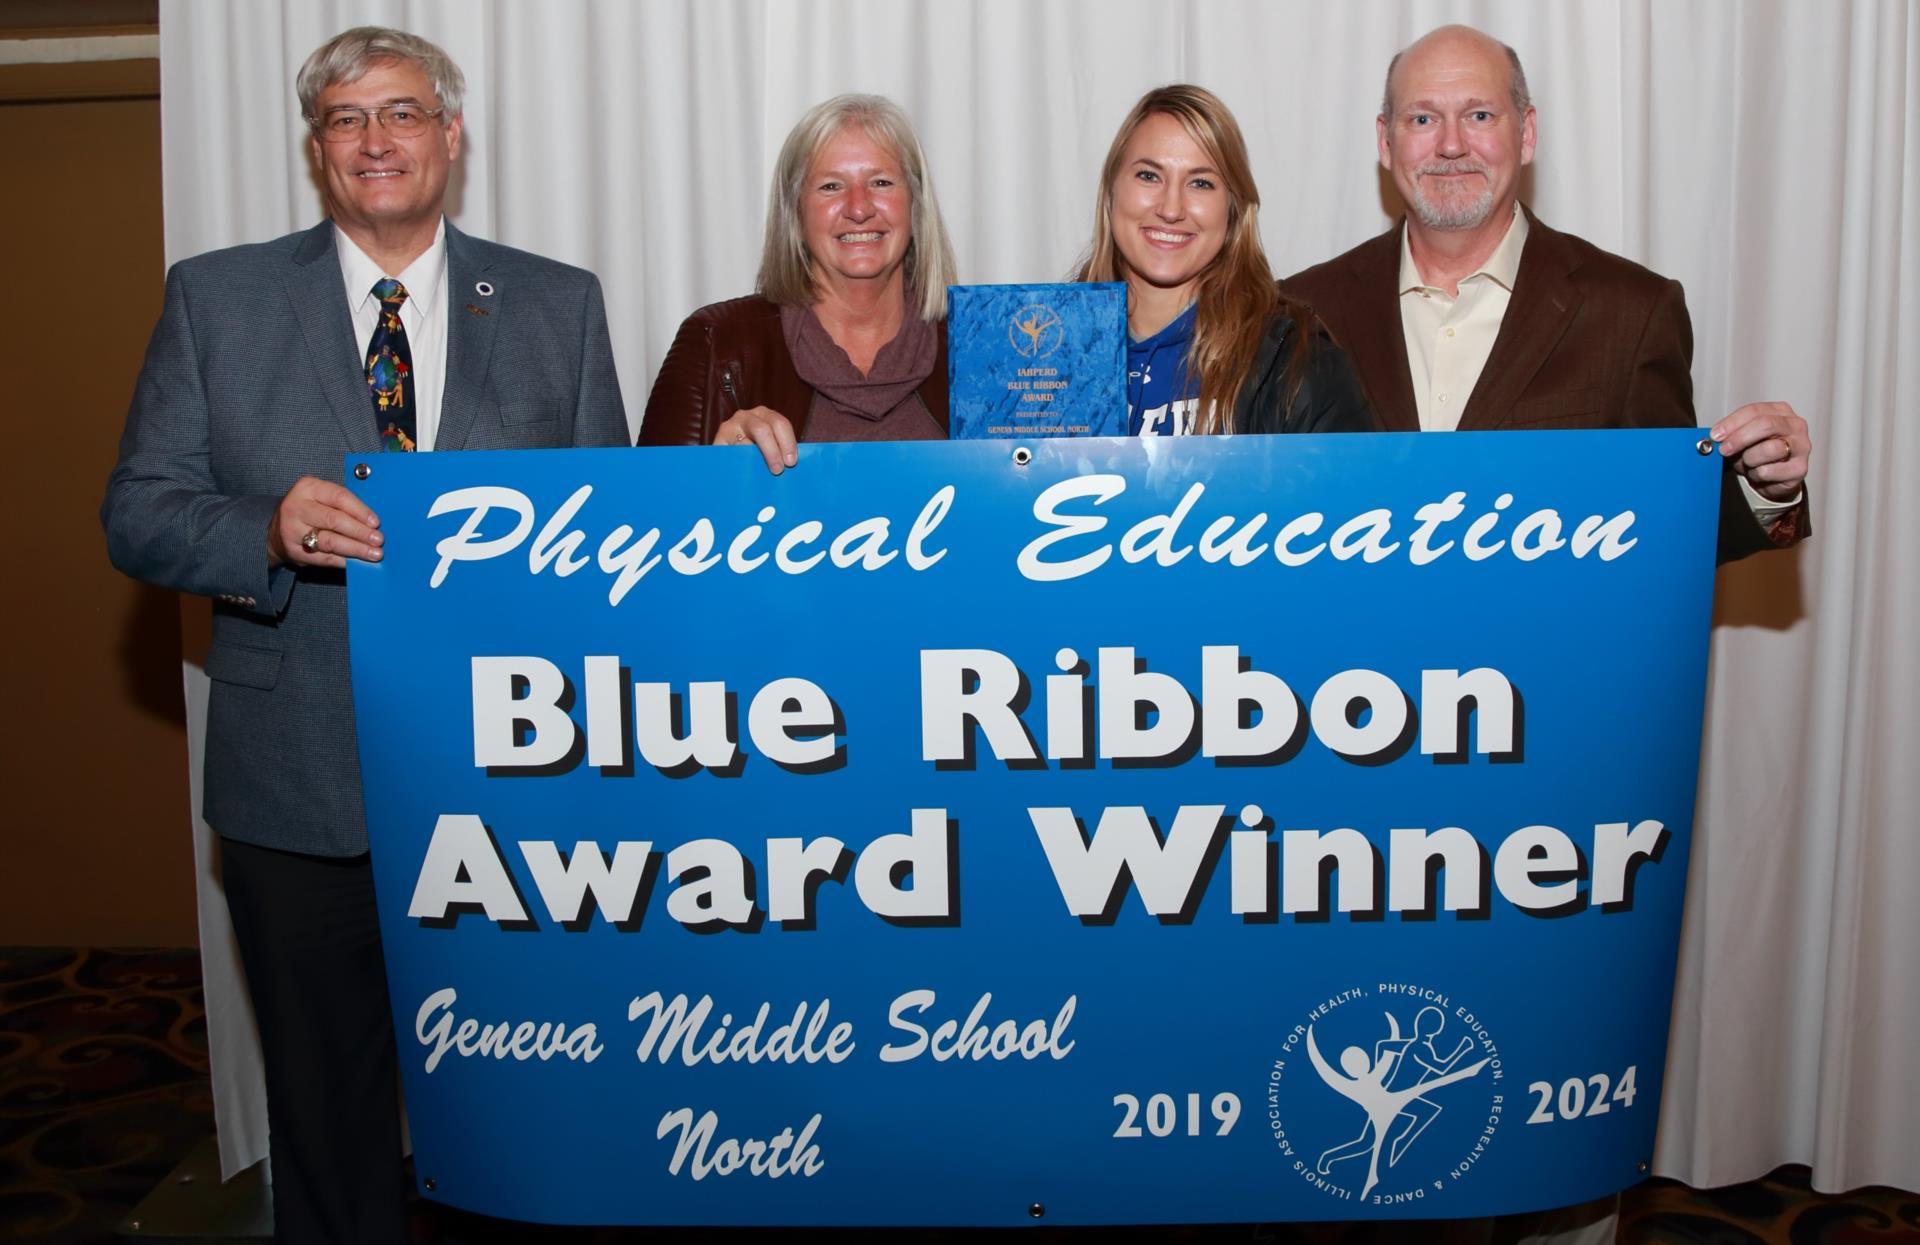 From left: Superintendent Kent Mutchler, GMS North PE Teachers Janet Nothnagel, Liz Assell, and Principal Larry Bidlack.